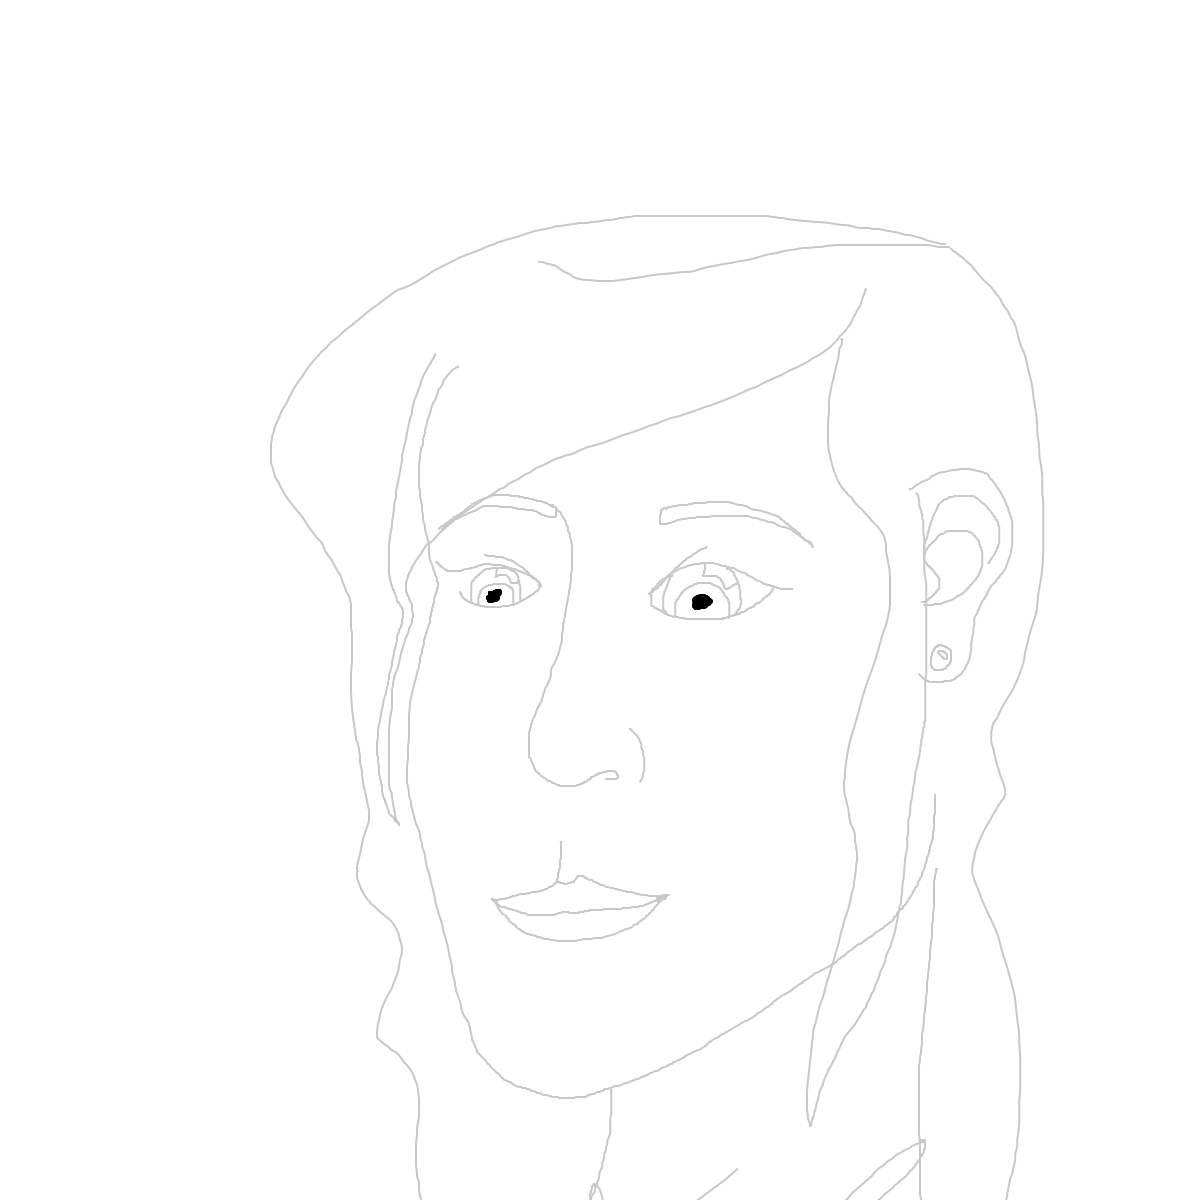 BAAAM drawing#12722 lat:52.4760627746582000lng: 13.4076395034790040